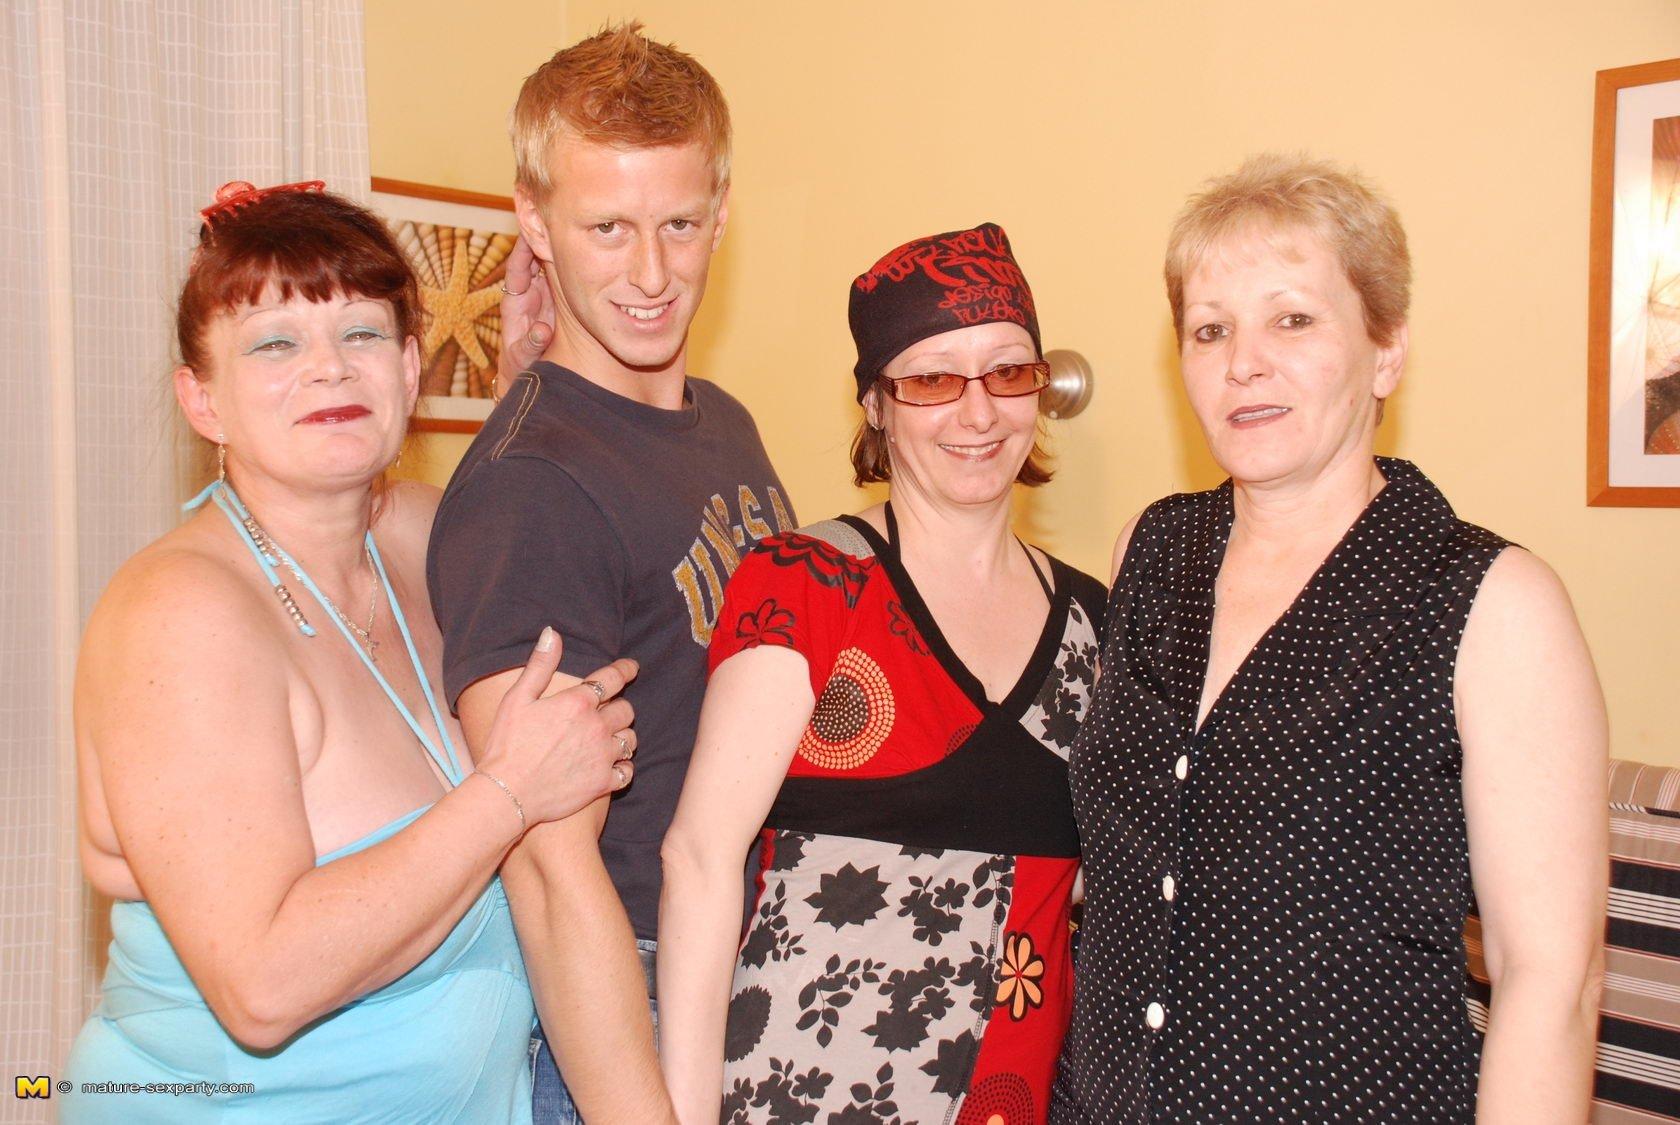 ЖЖЖМ (три женщины и мужчина) - Фото галерея 771911